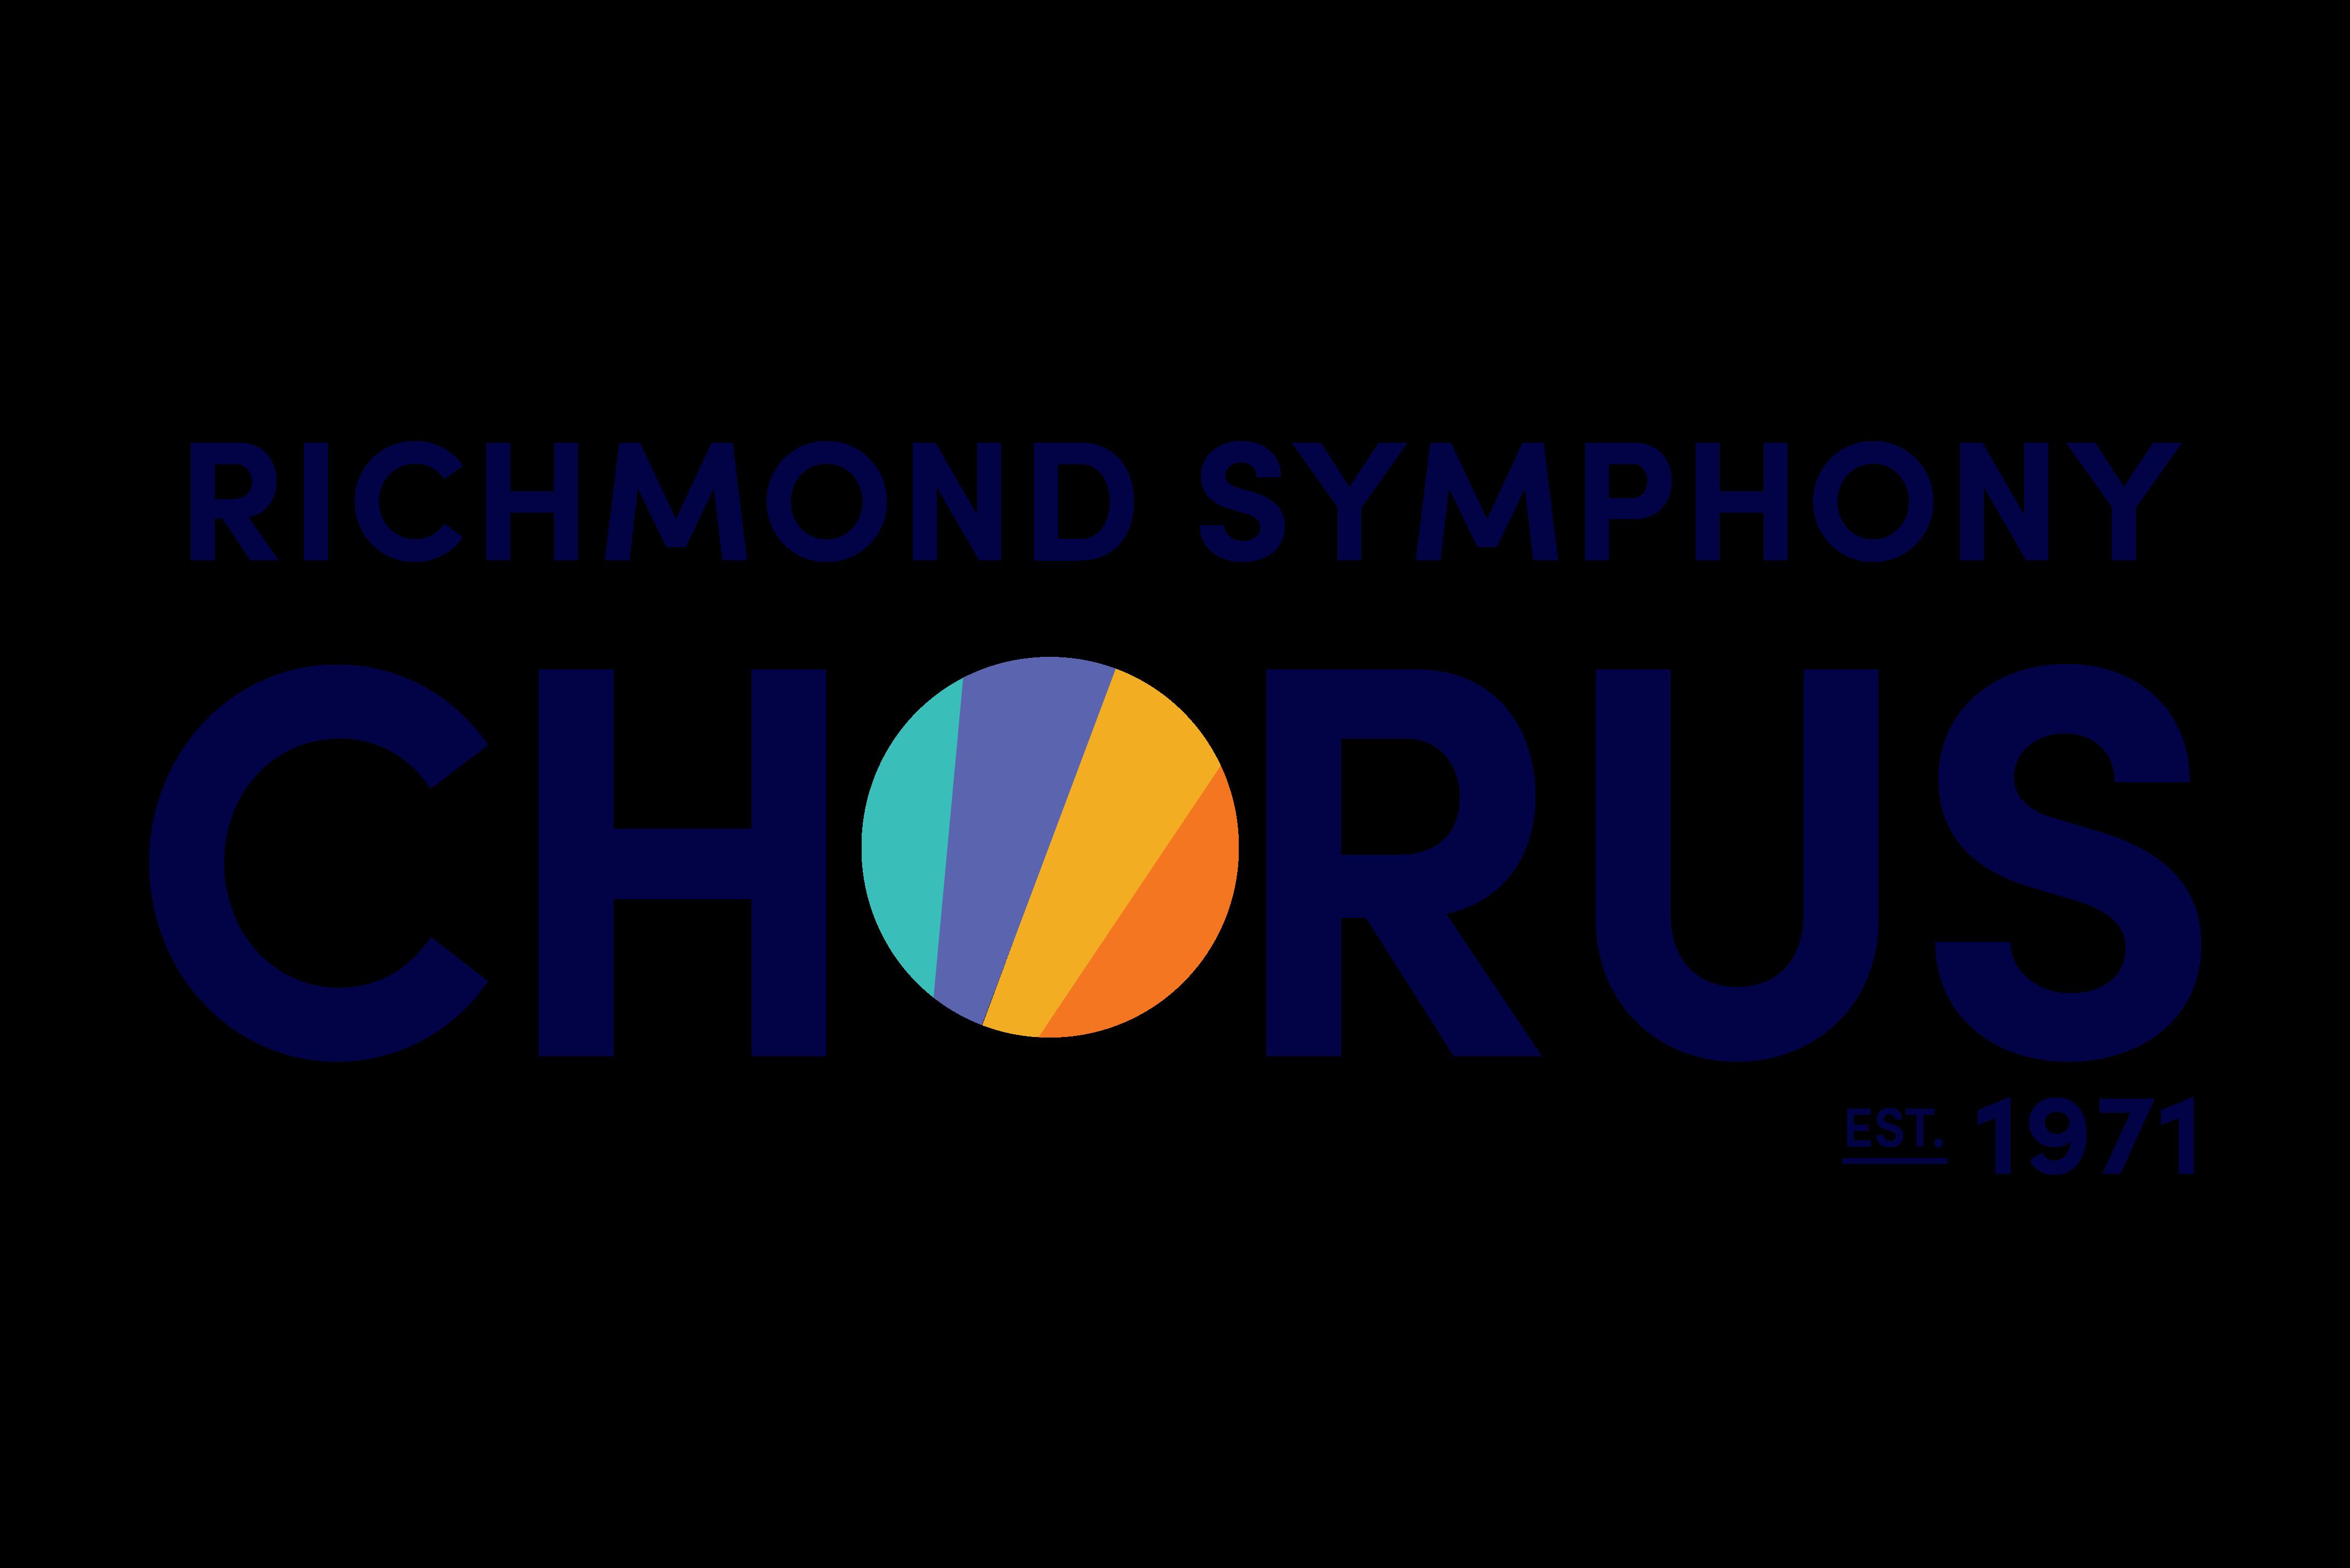 Richmond Symphony Chorus logo